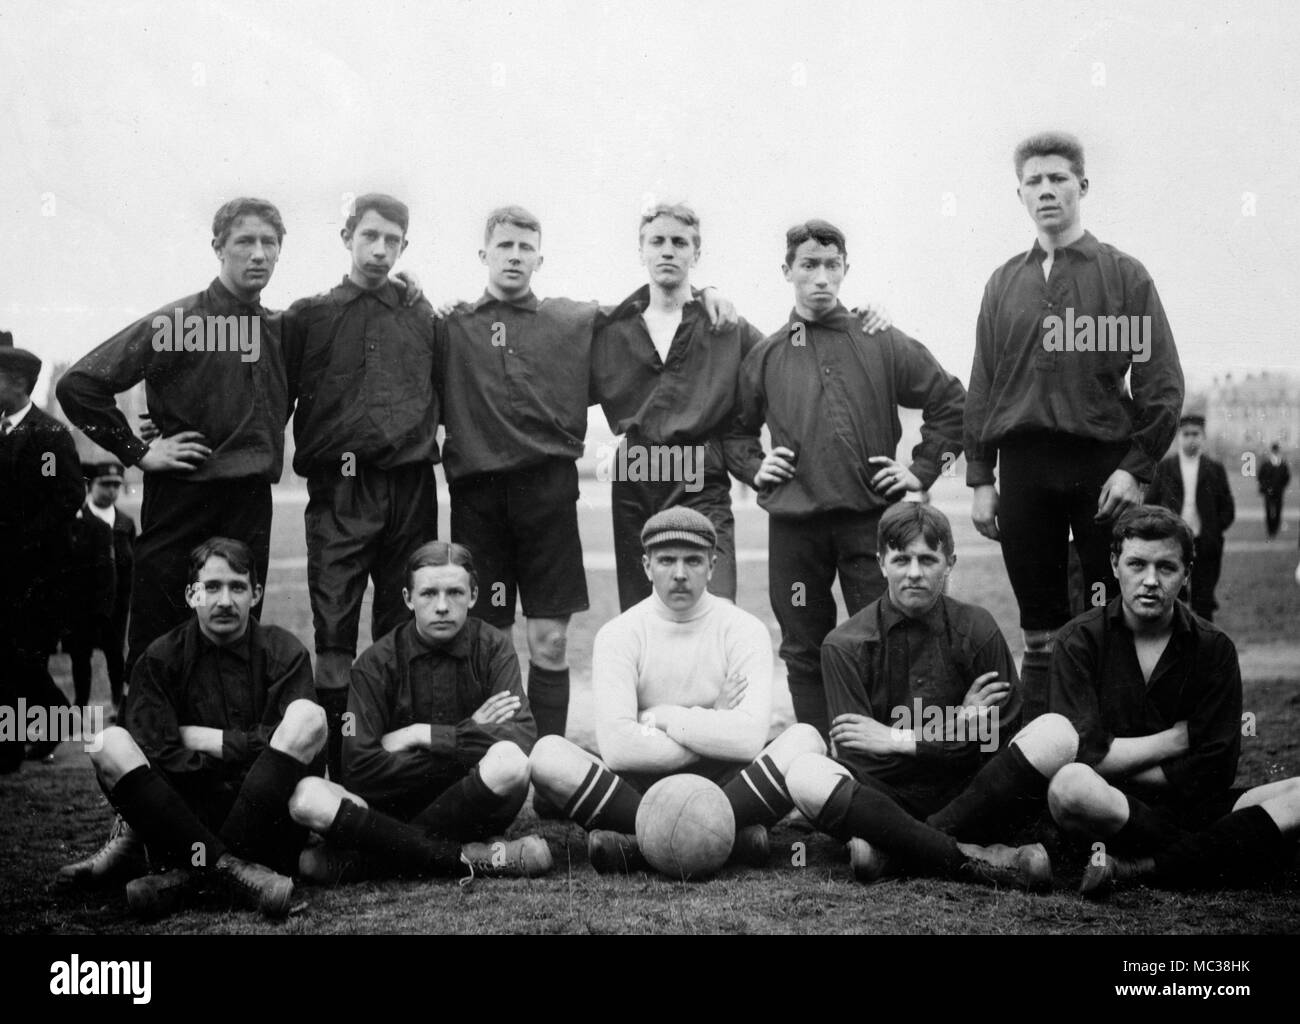 Swedish football team group portrait, ca. 1912. - Stock Image